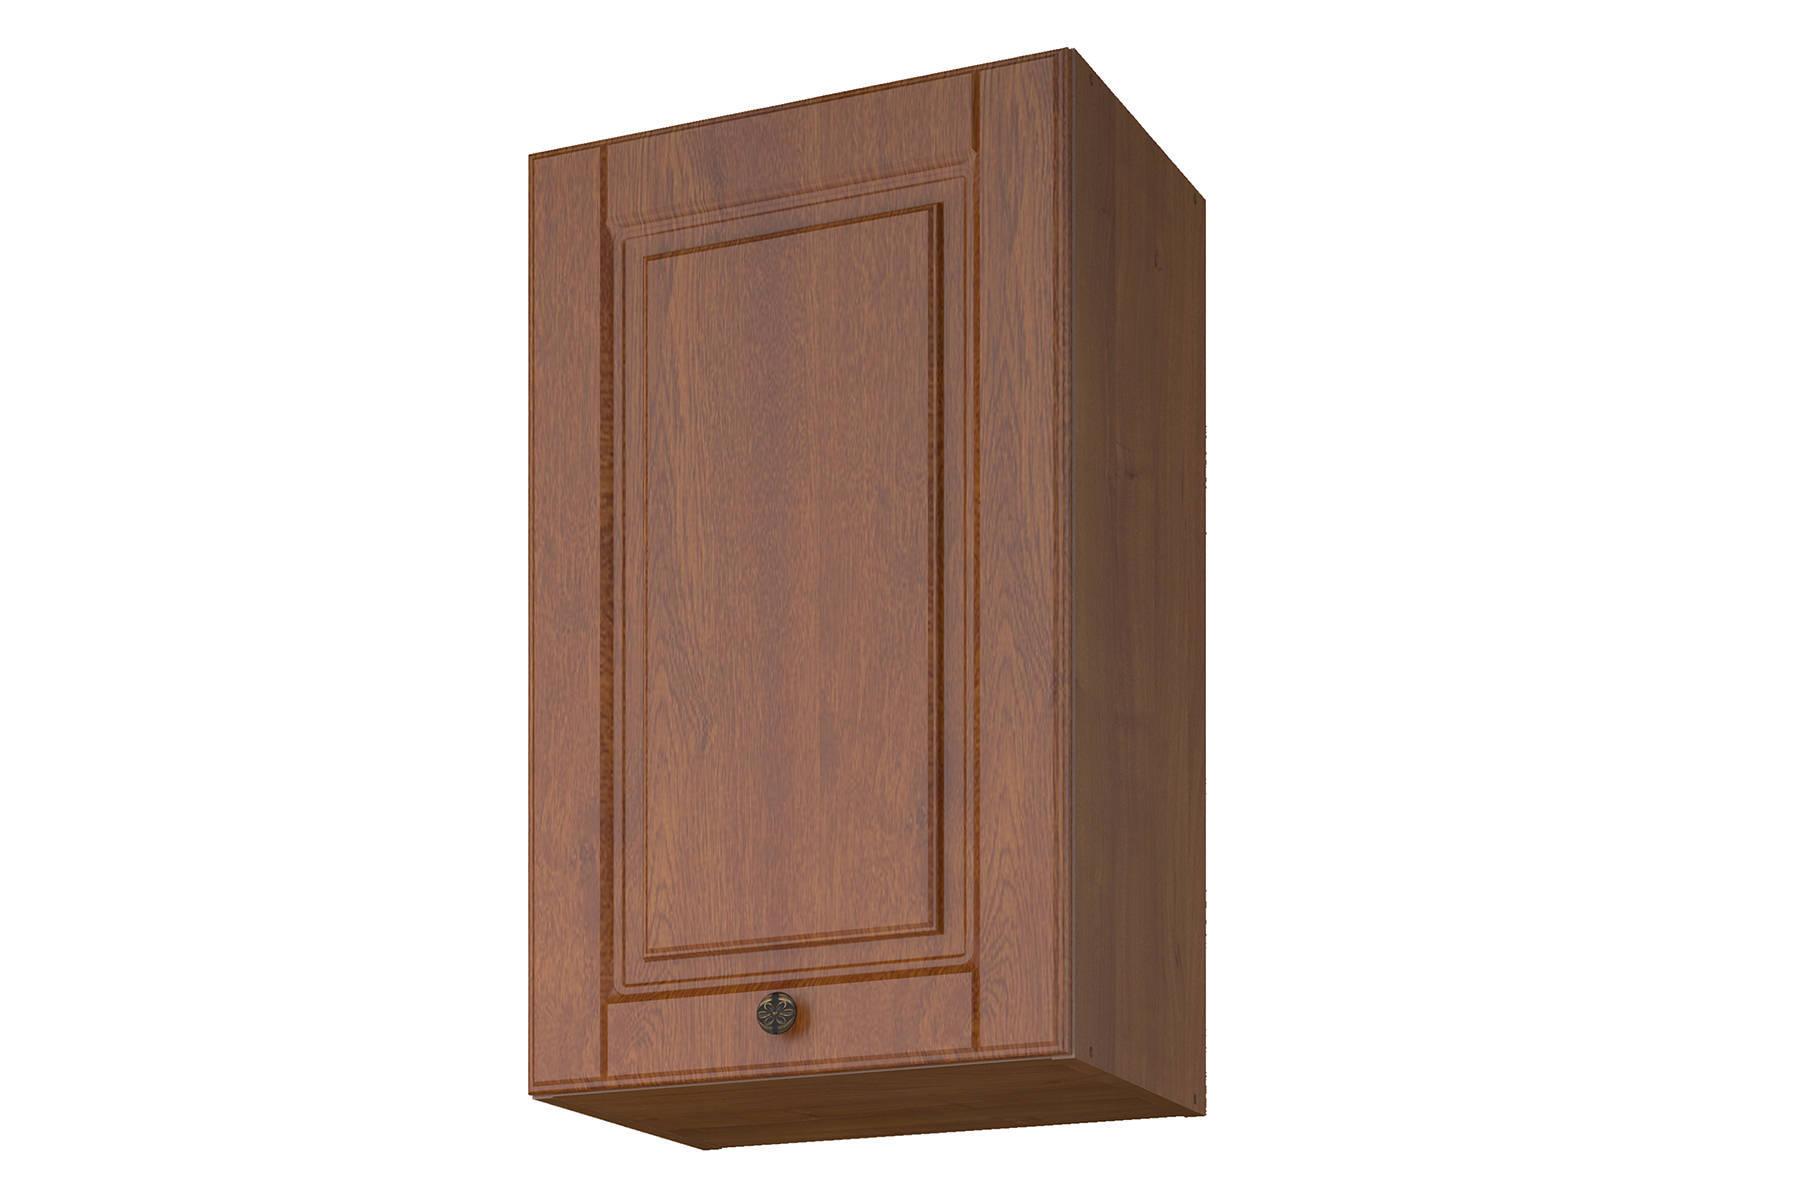 Шкаф навесной Lima СТЛ.308.01 шкаф навесной для вытяжки lima стл 308 04